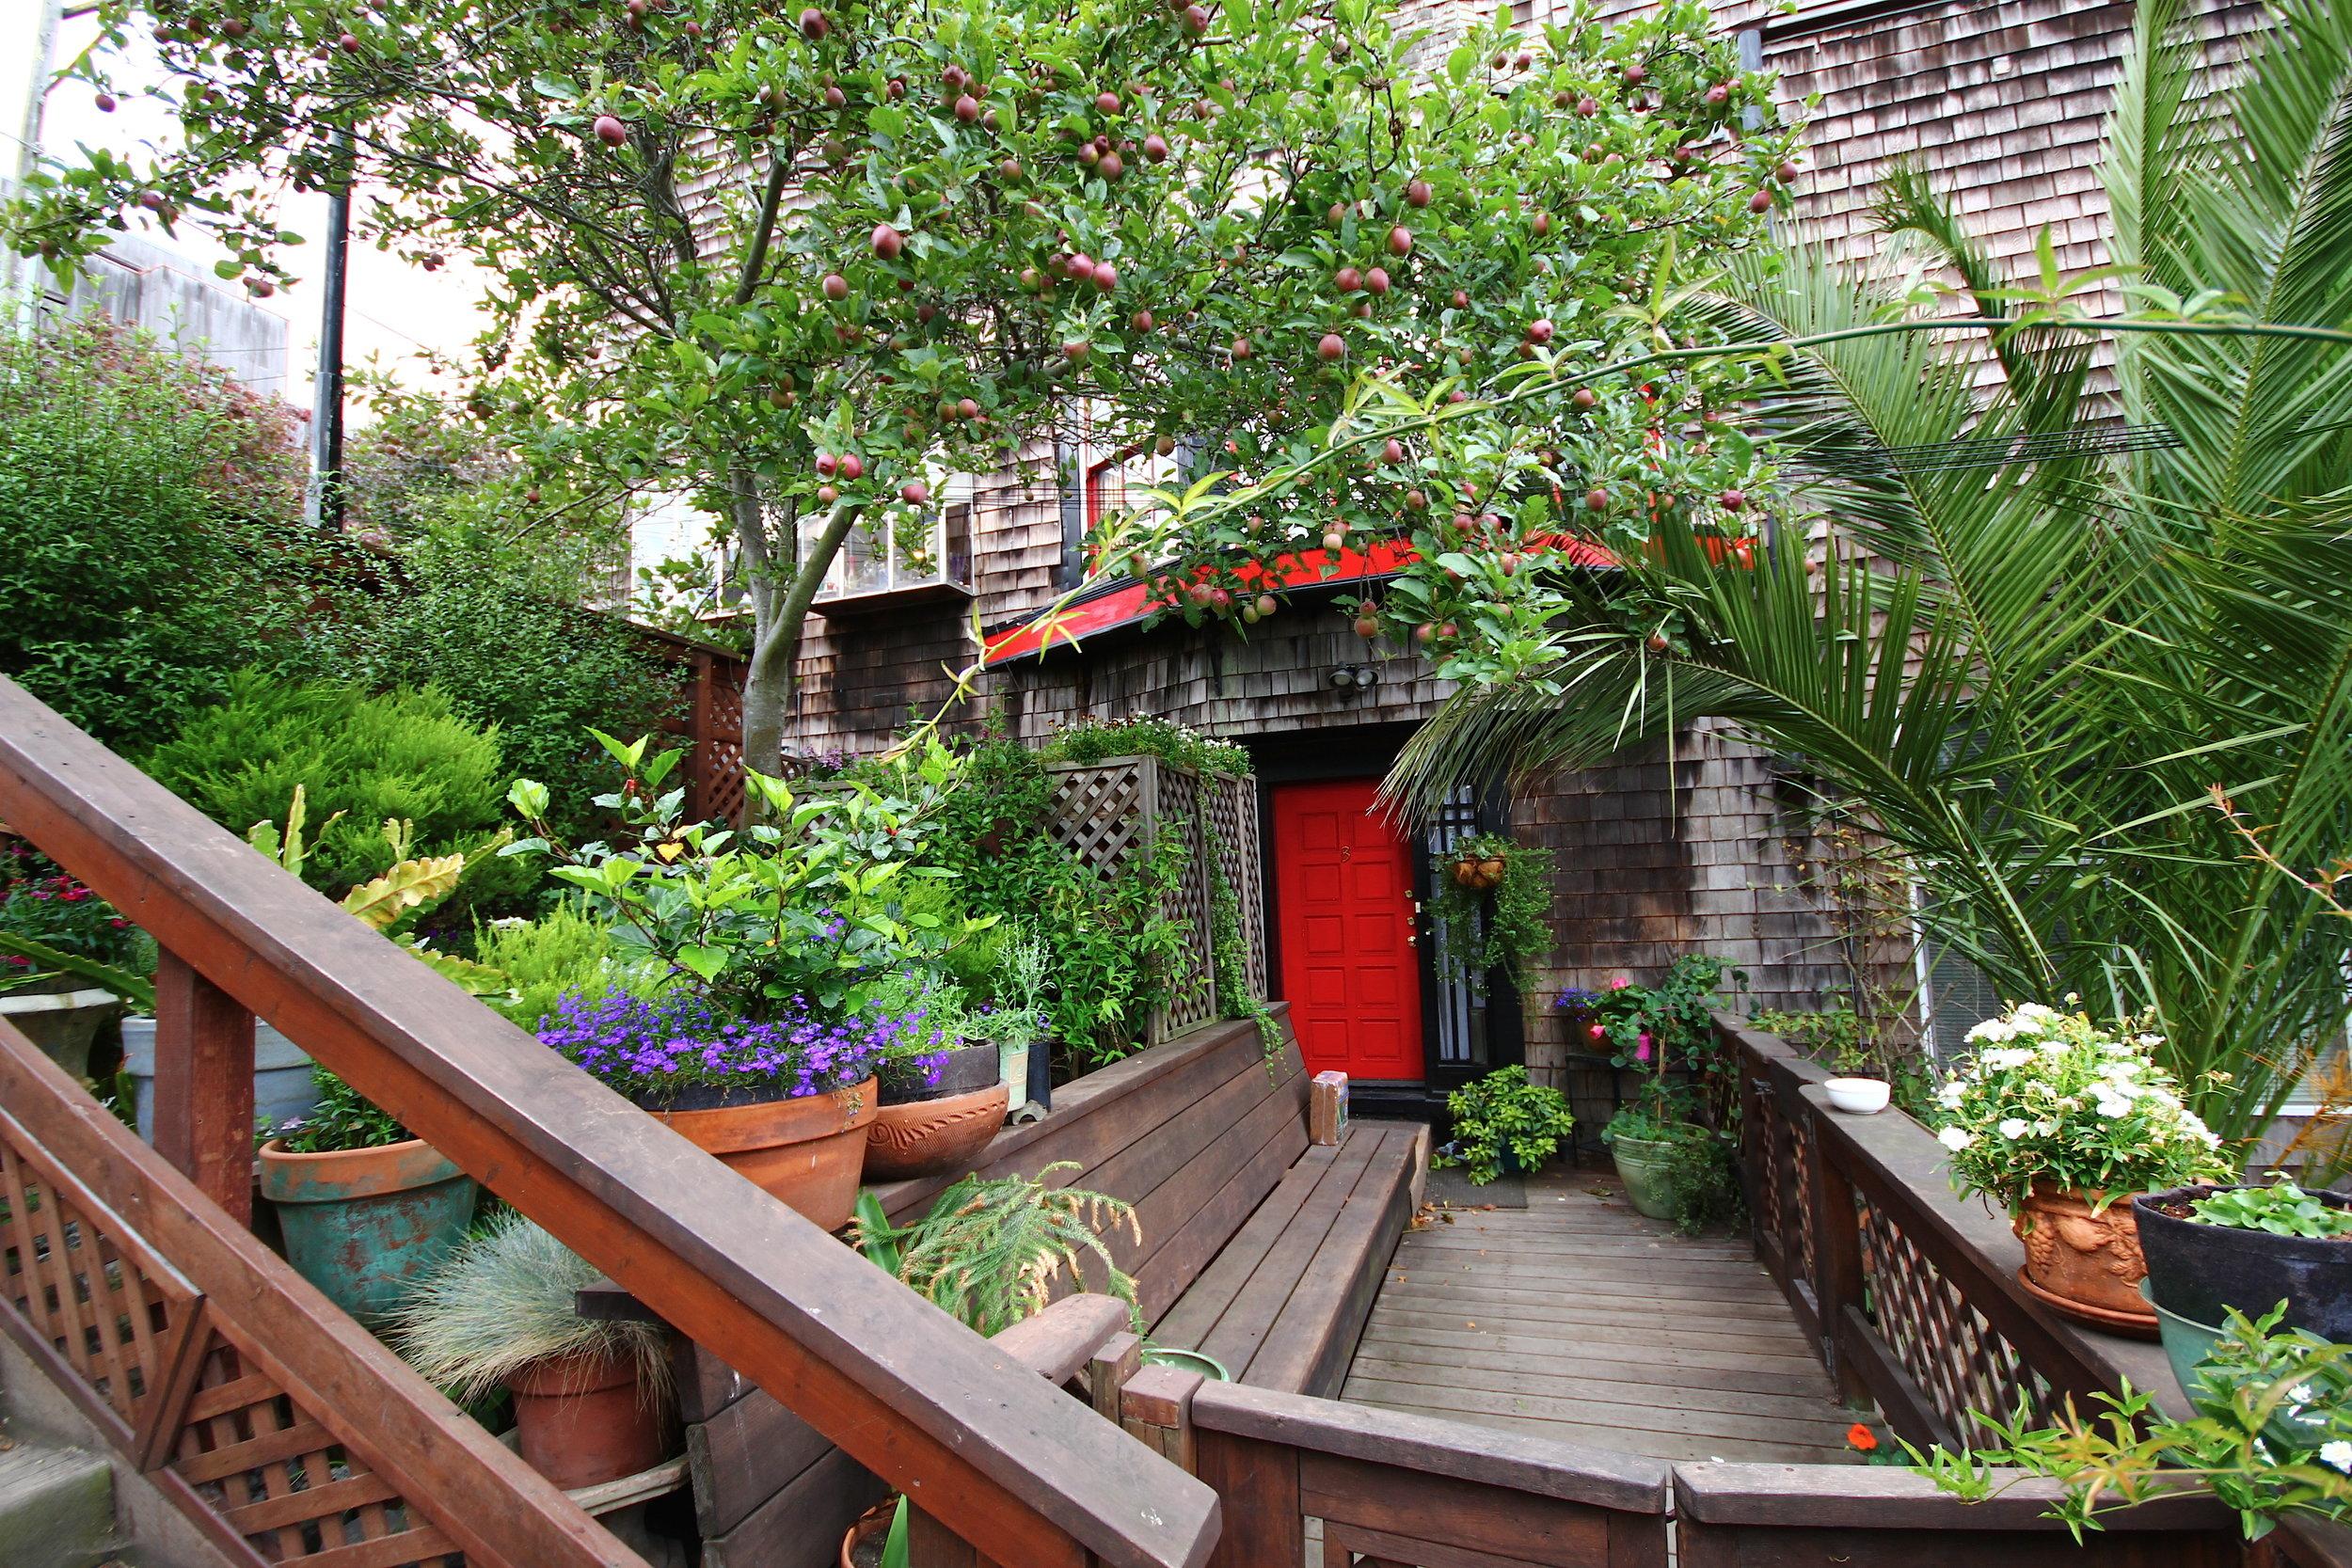 Hidden gems of Bernal Heights -This is straight out of a romance novel!